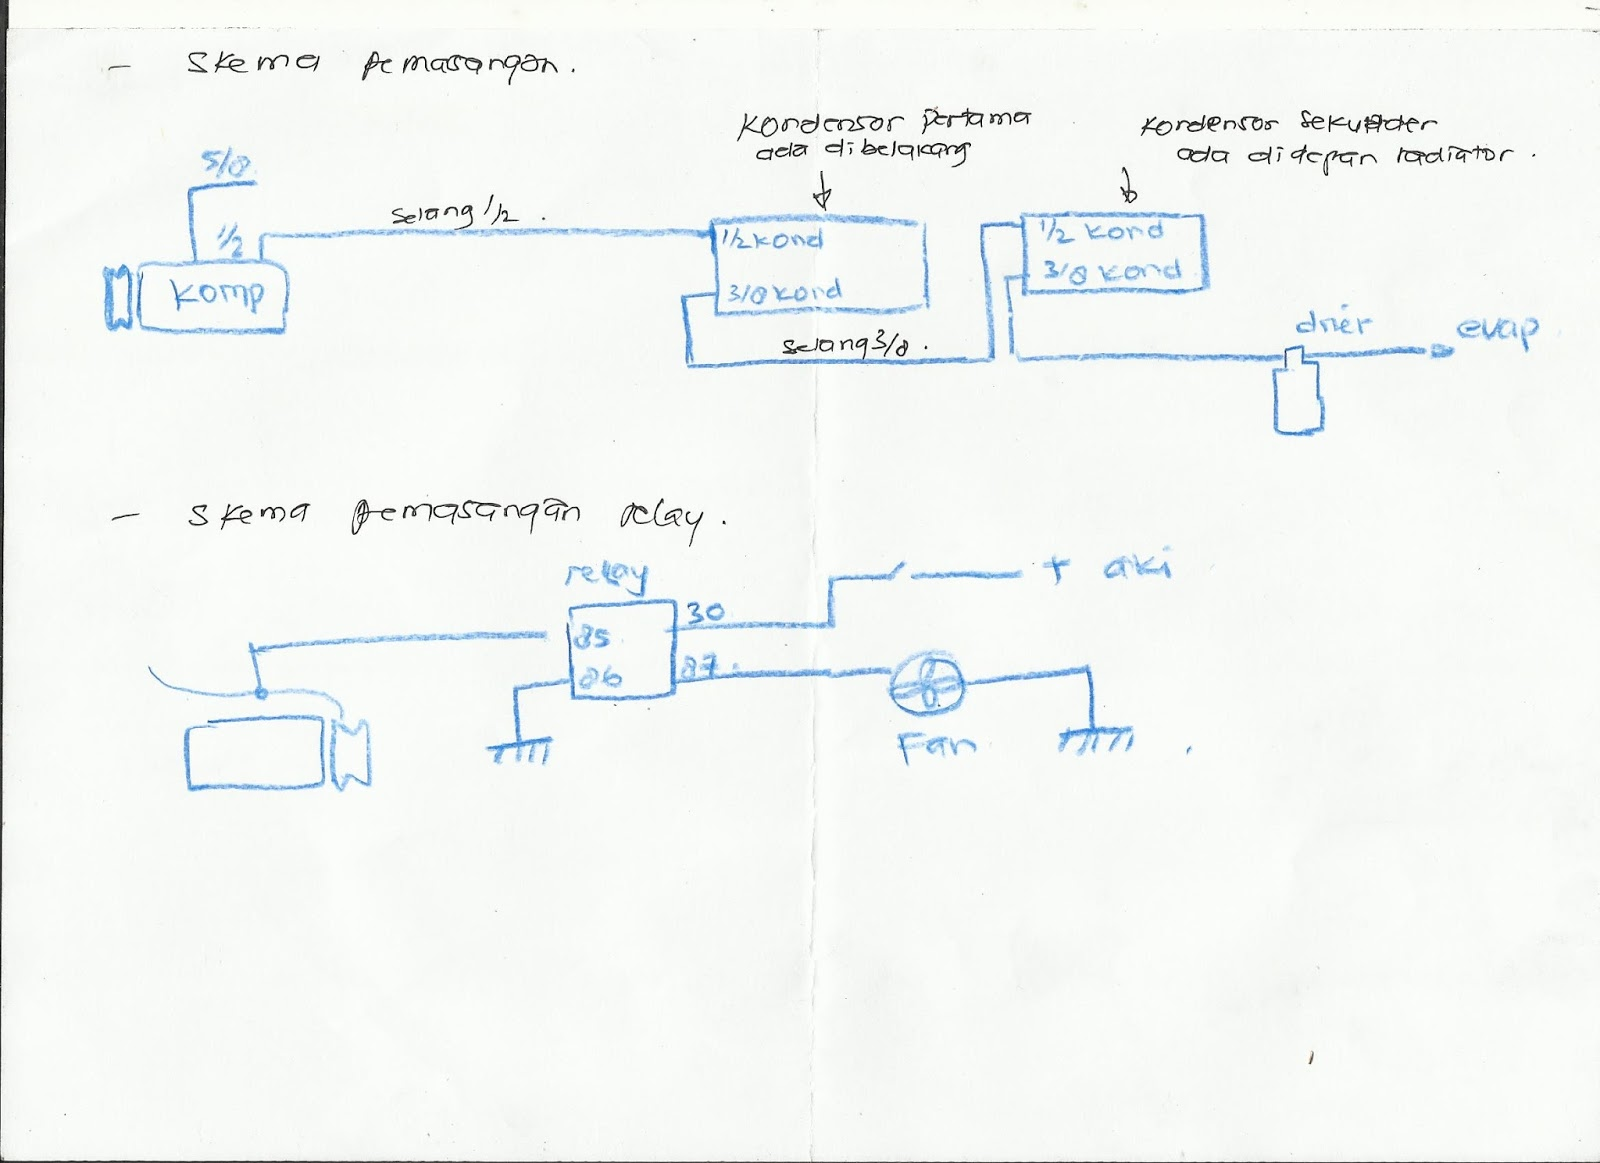 rangkaian wiring sederhana dan pengukurannya [ 1600 x 1163 Pixel ]